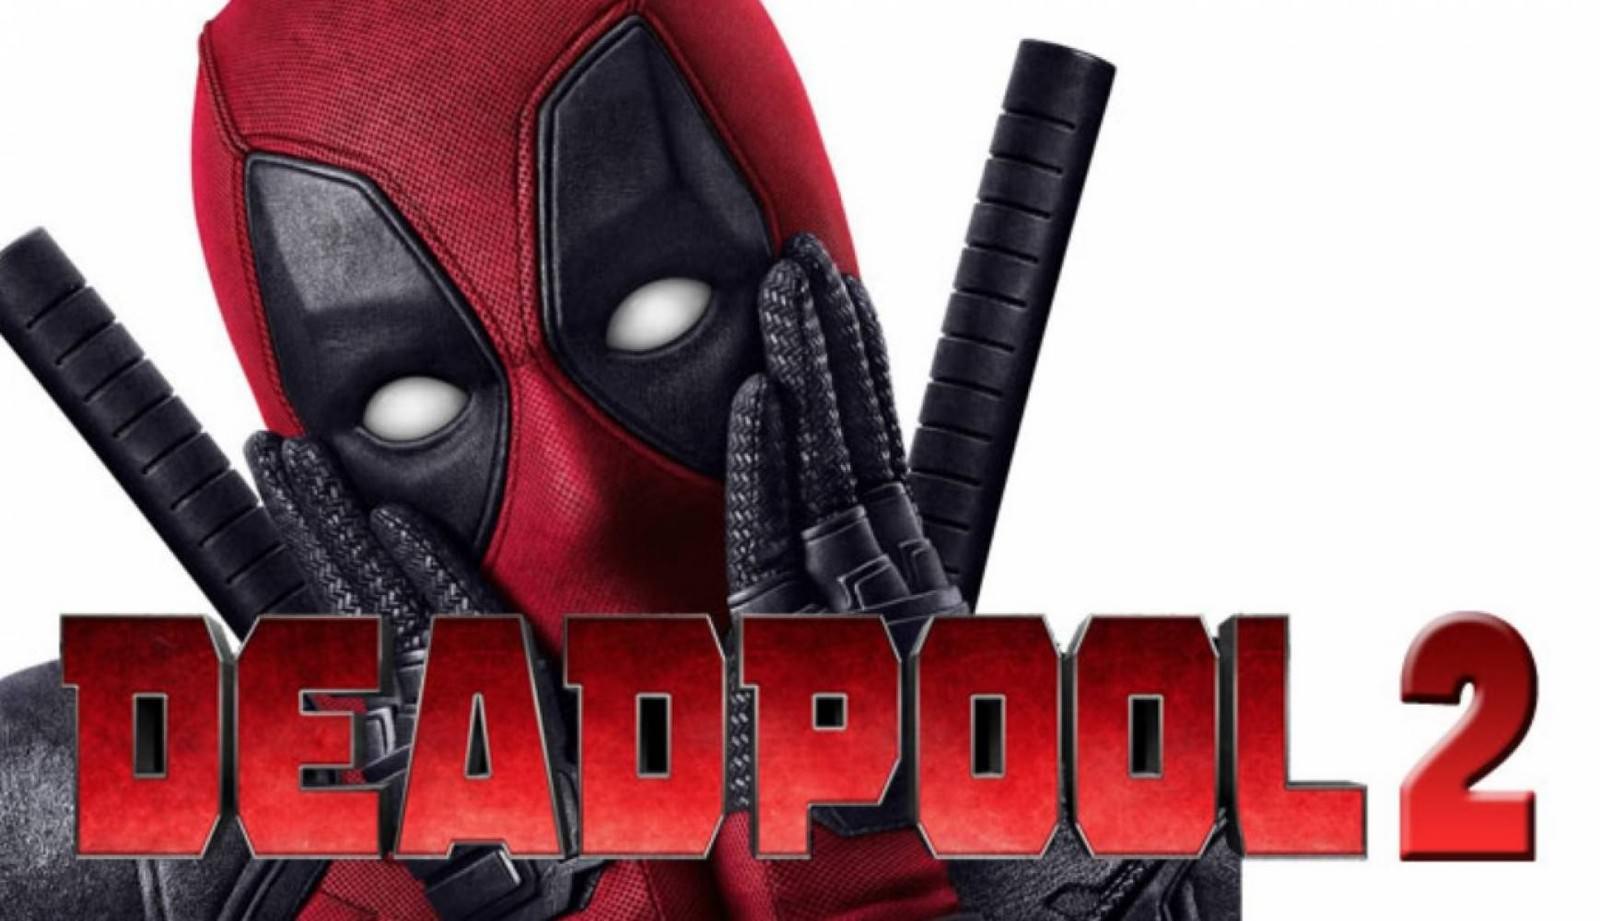 Movie, Deadpool 2(美國) / 死侍2(台.中.港), 電影海報, 橫版